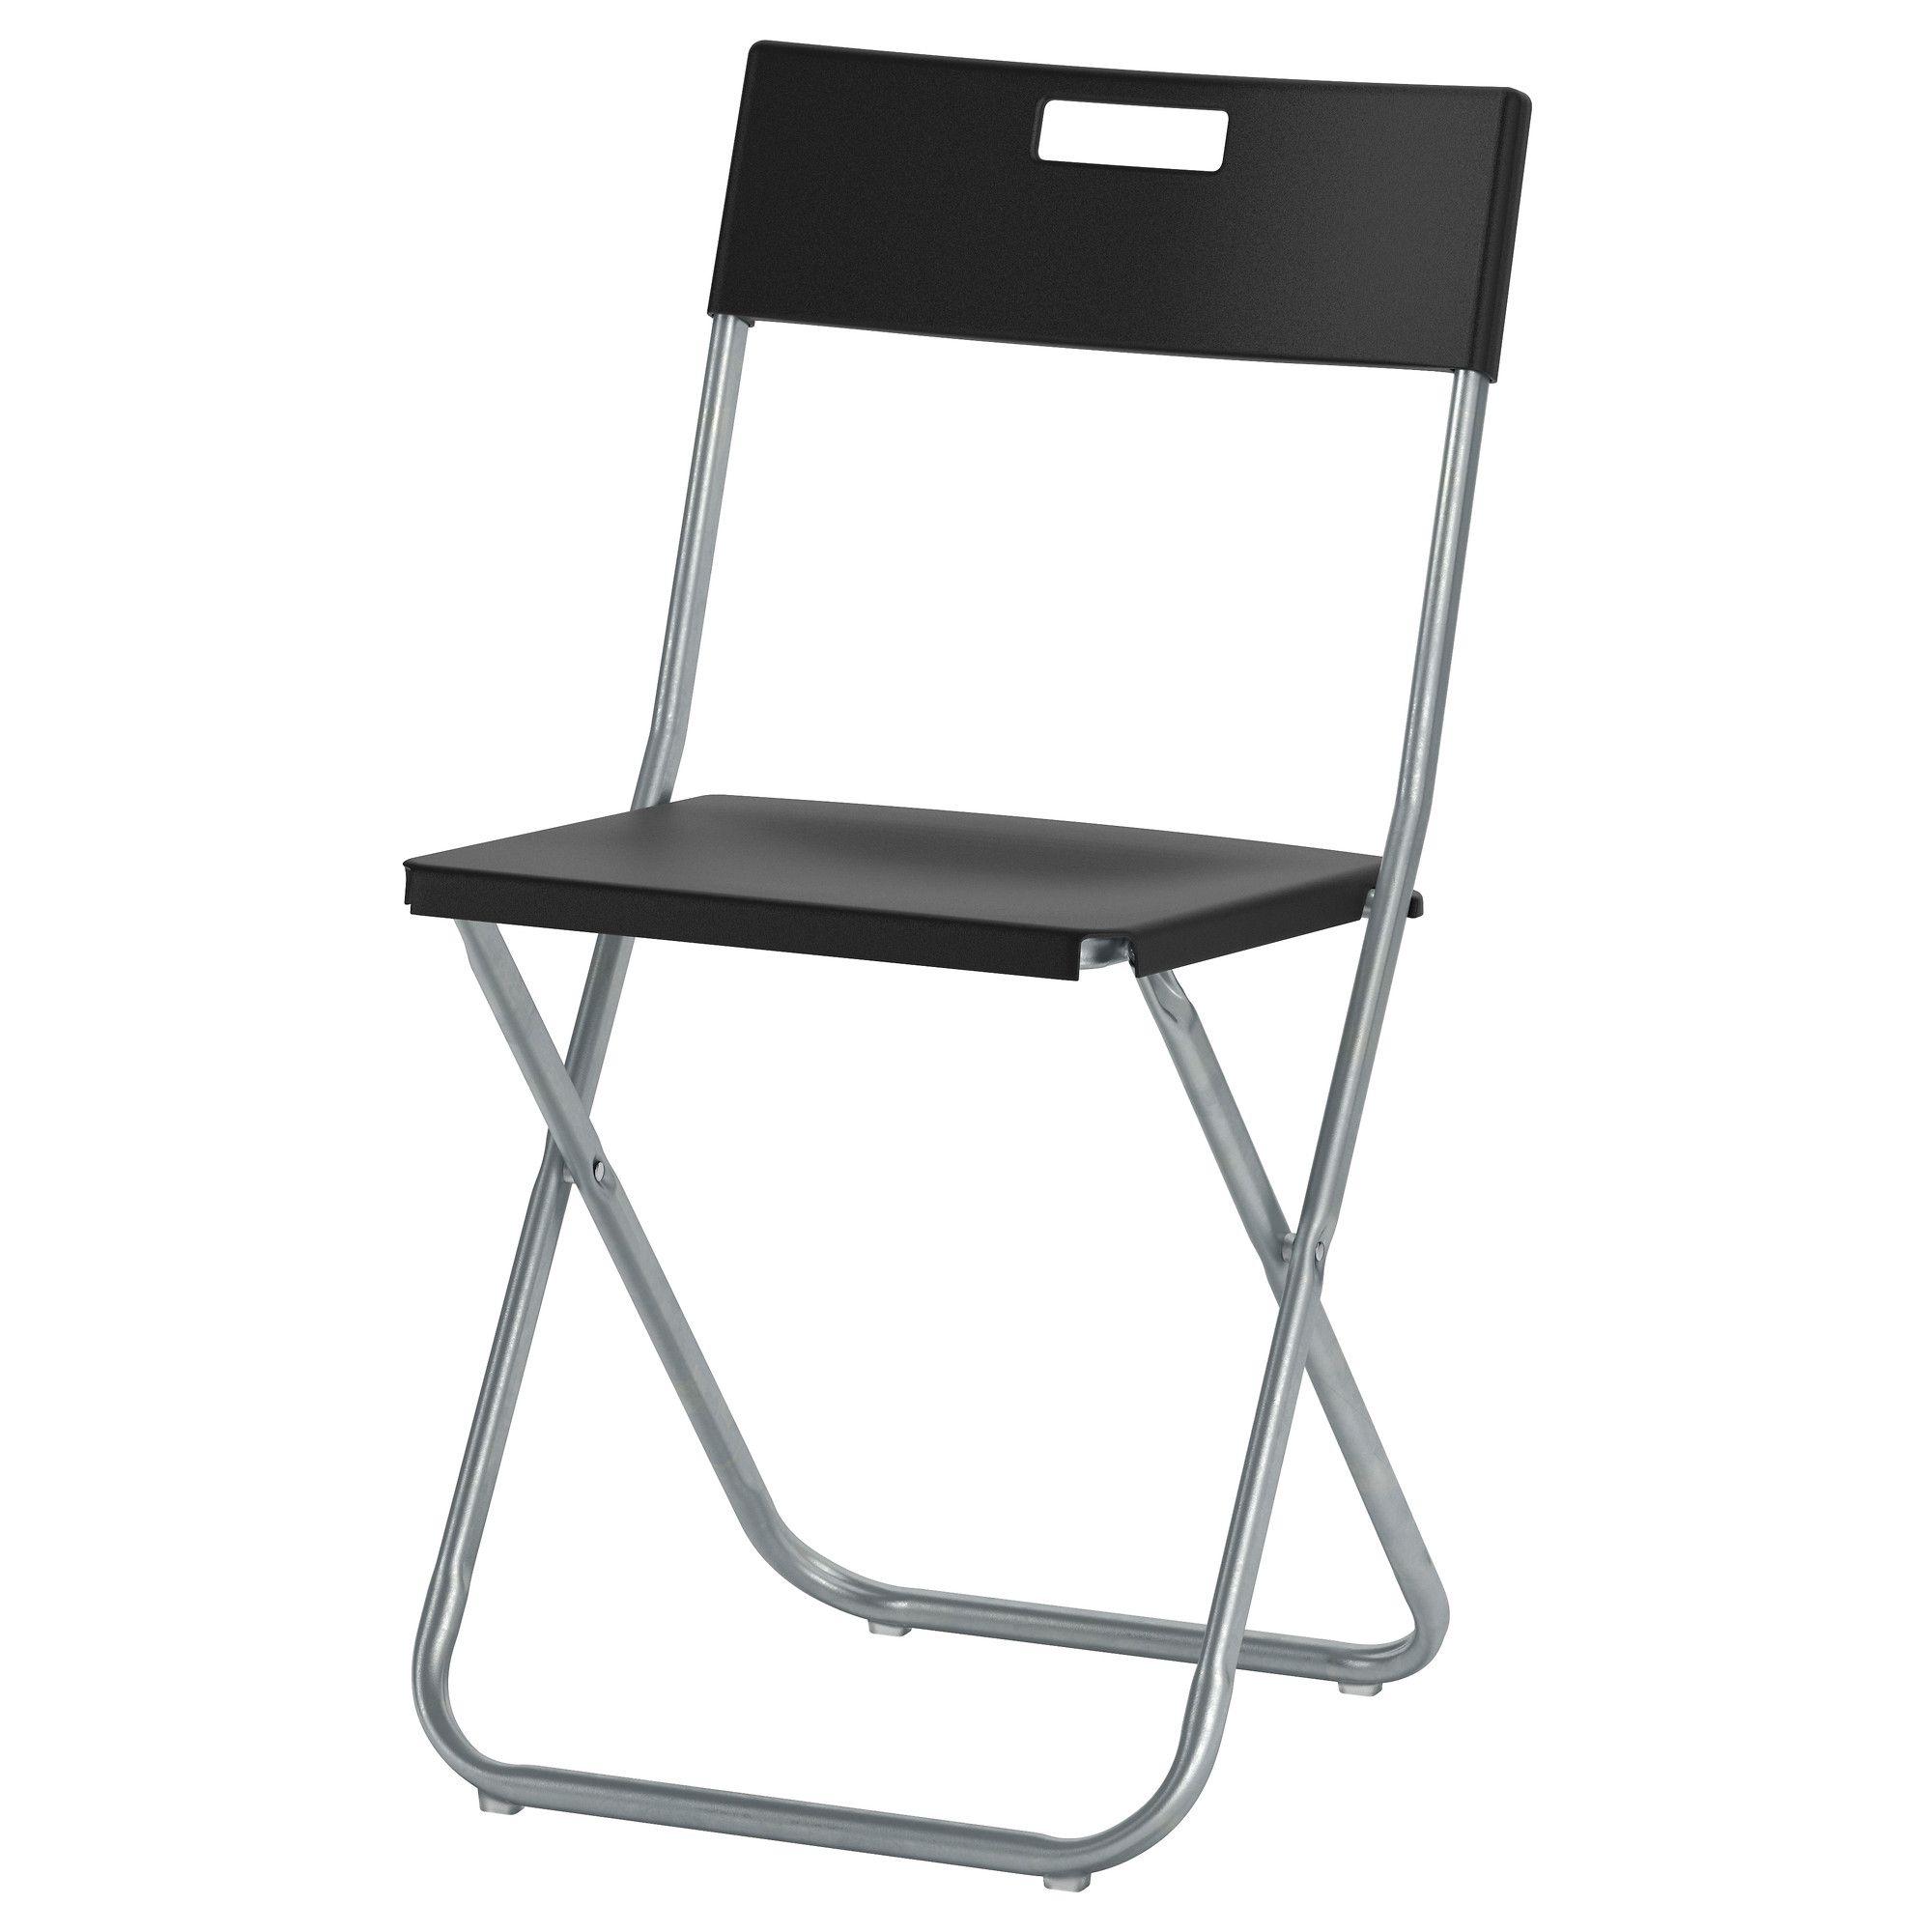 Gunde Folding Chair Black Ikea Folding Chair Ikea Folding Chairs Ikea Dining Chair